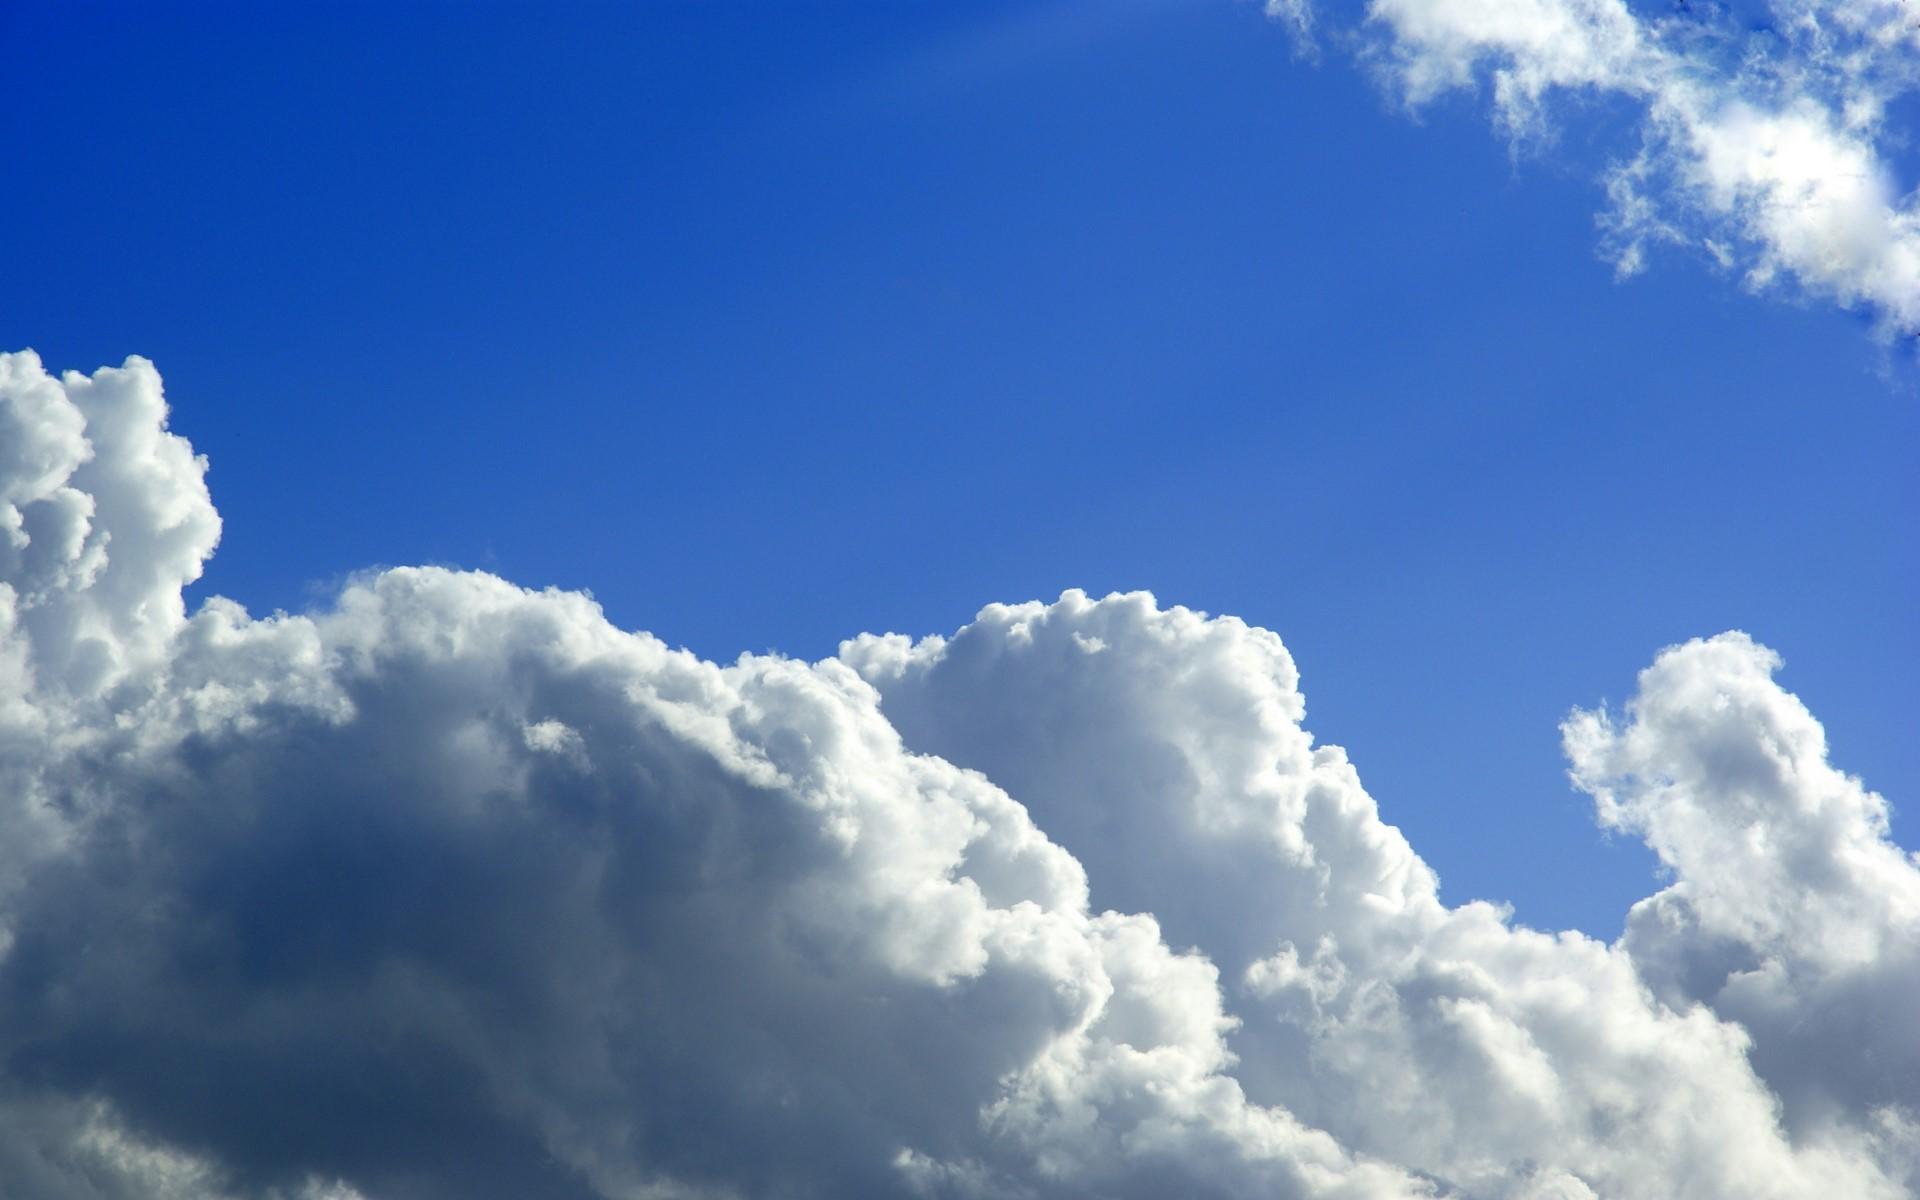 Warna langit biru yang didominasi oleh hamburan warna biru dari cahaya matahari. Credit : wallcoo.net